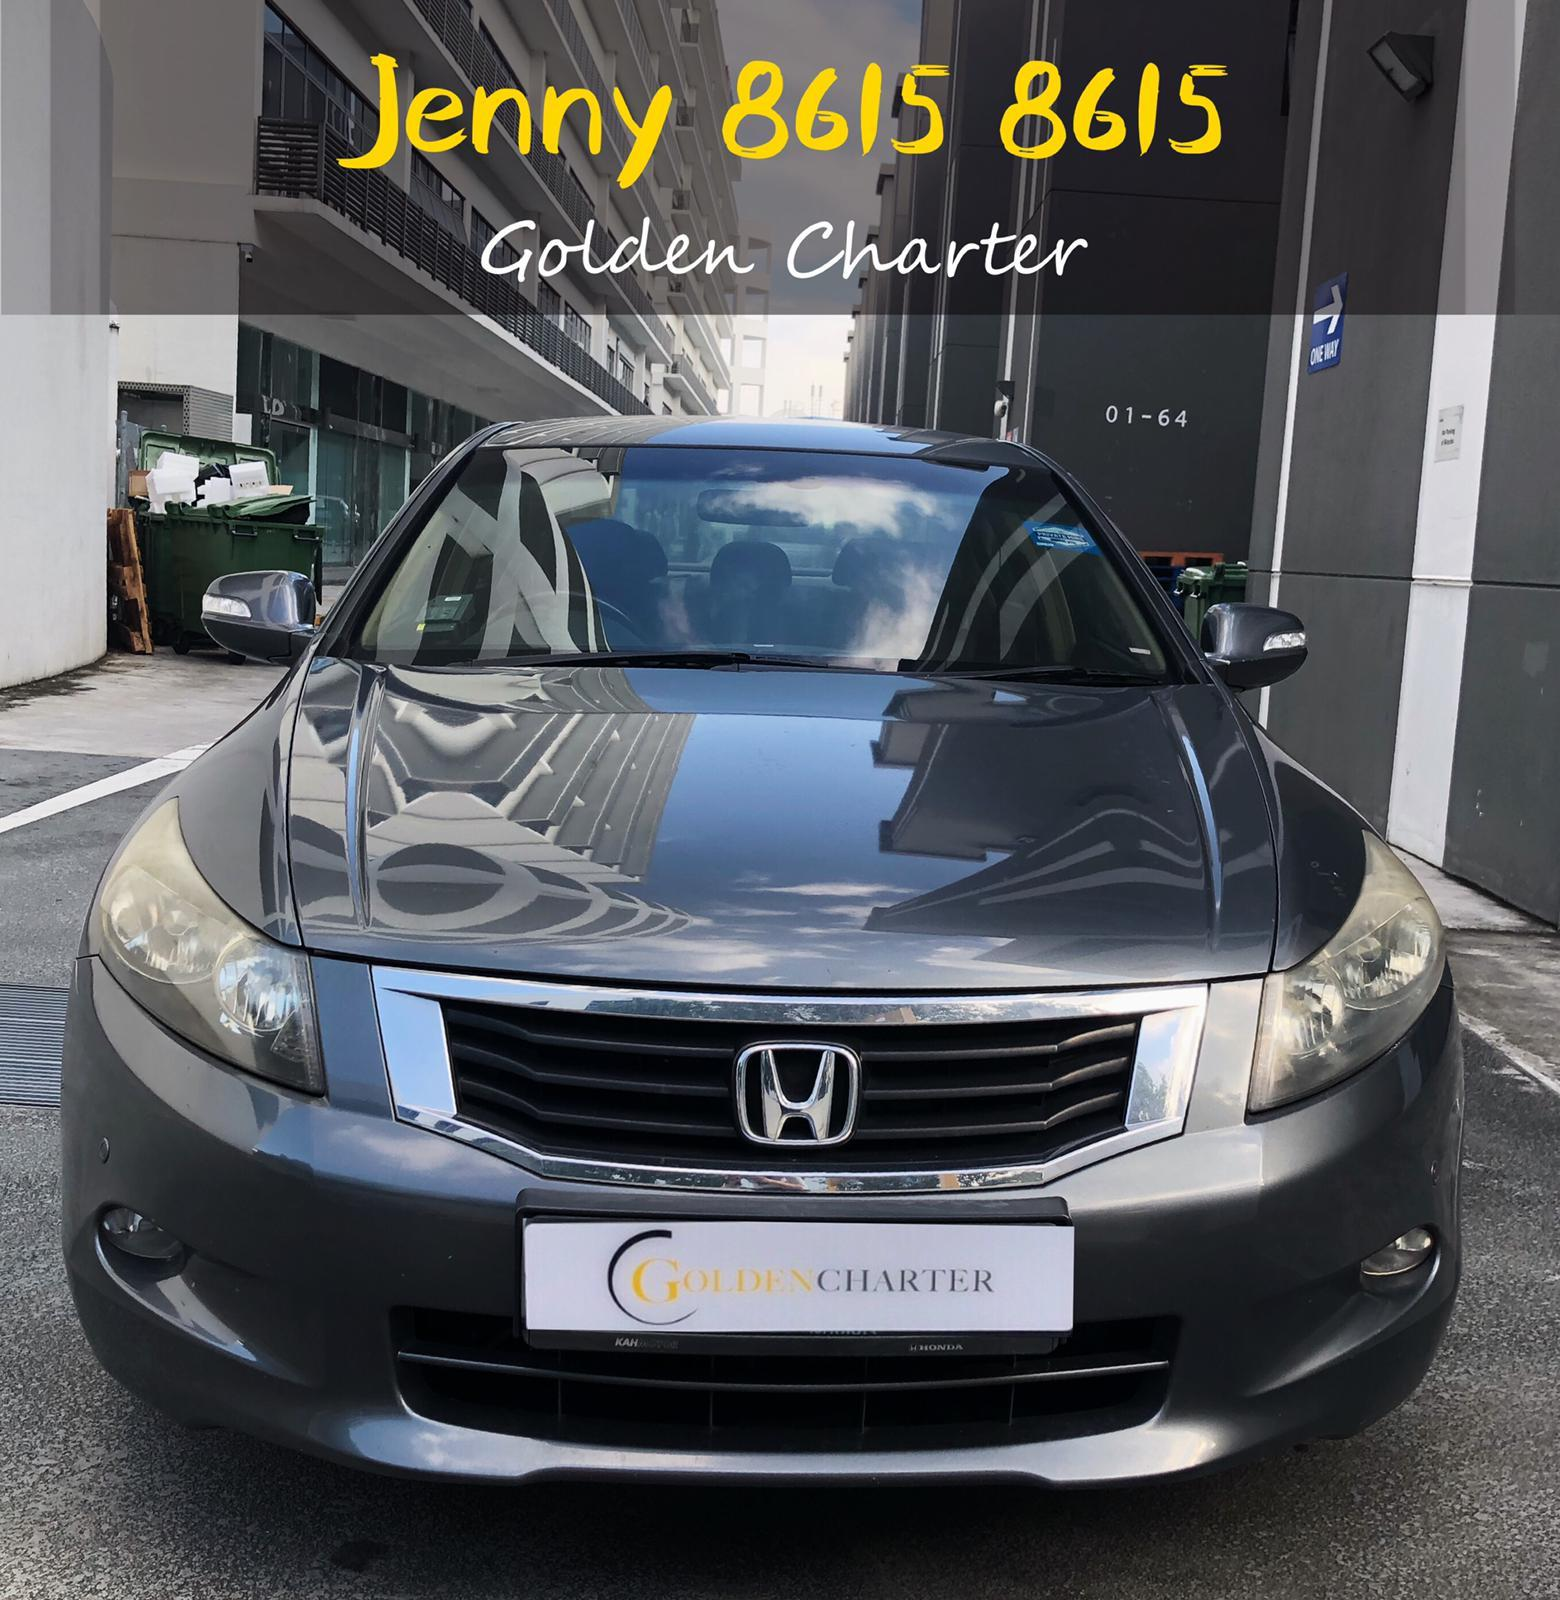 HONDA ACCORD cheapest rental toyota altis allion camry hyundai avante conti cars suitable for grab gojek n personal use.min 2 mth